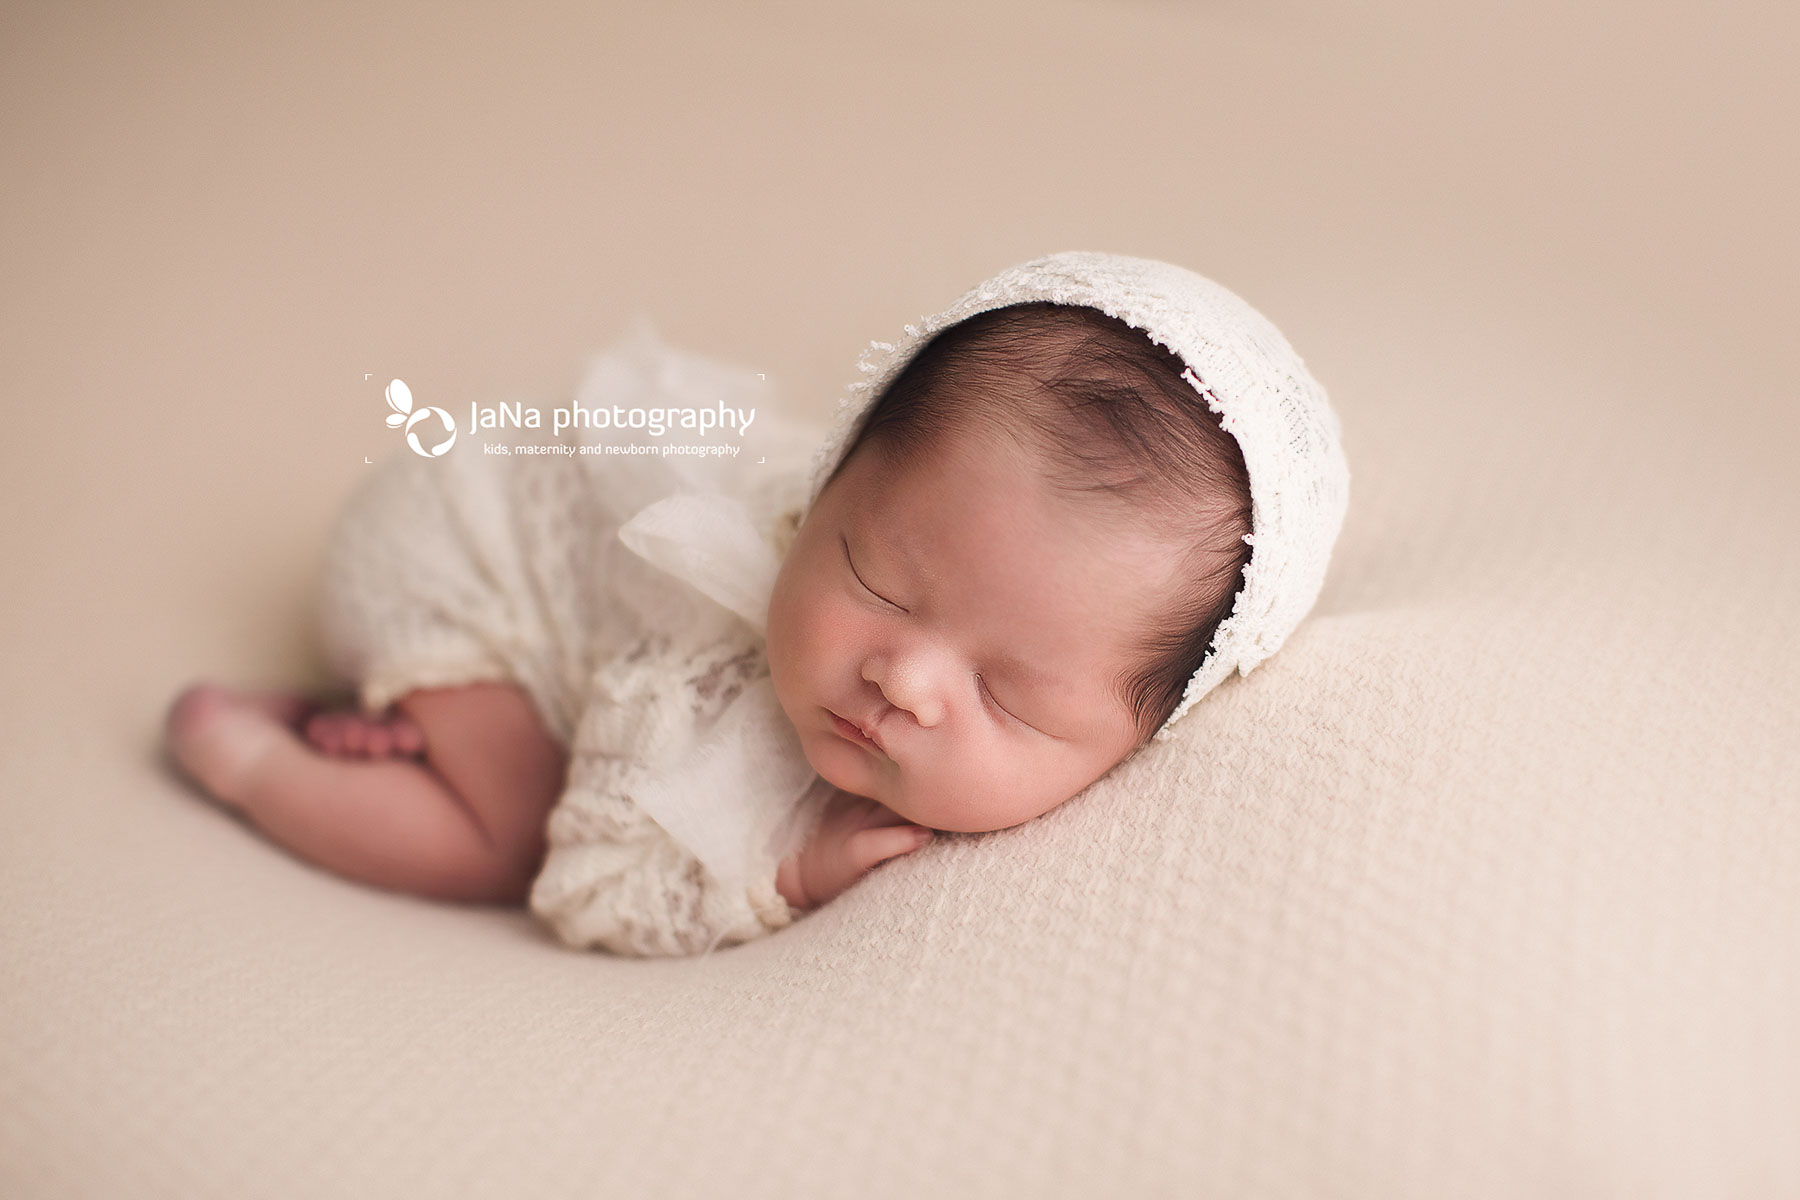 white setup-baby girl photos-jana